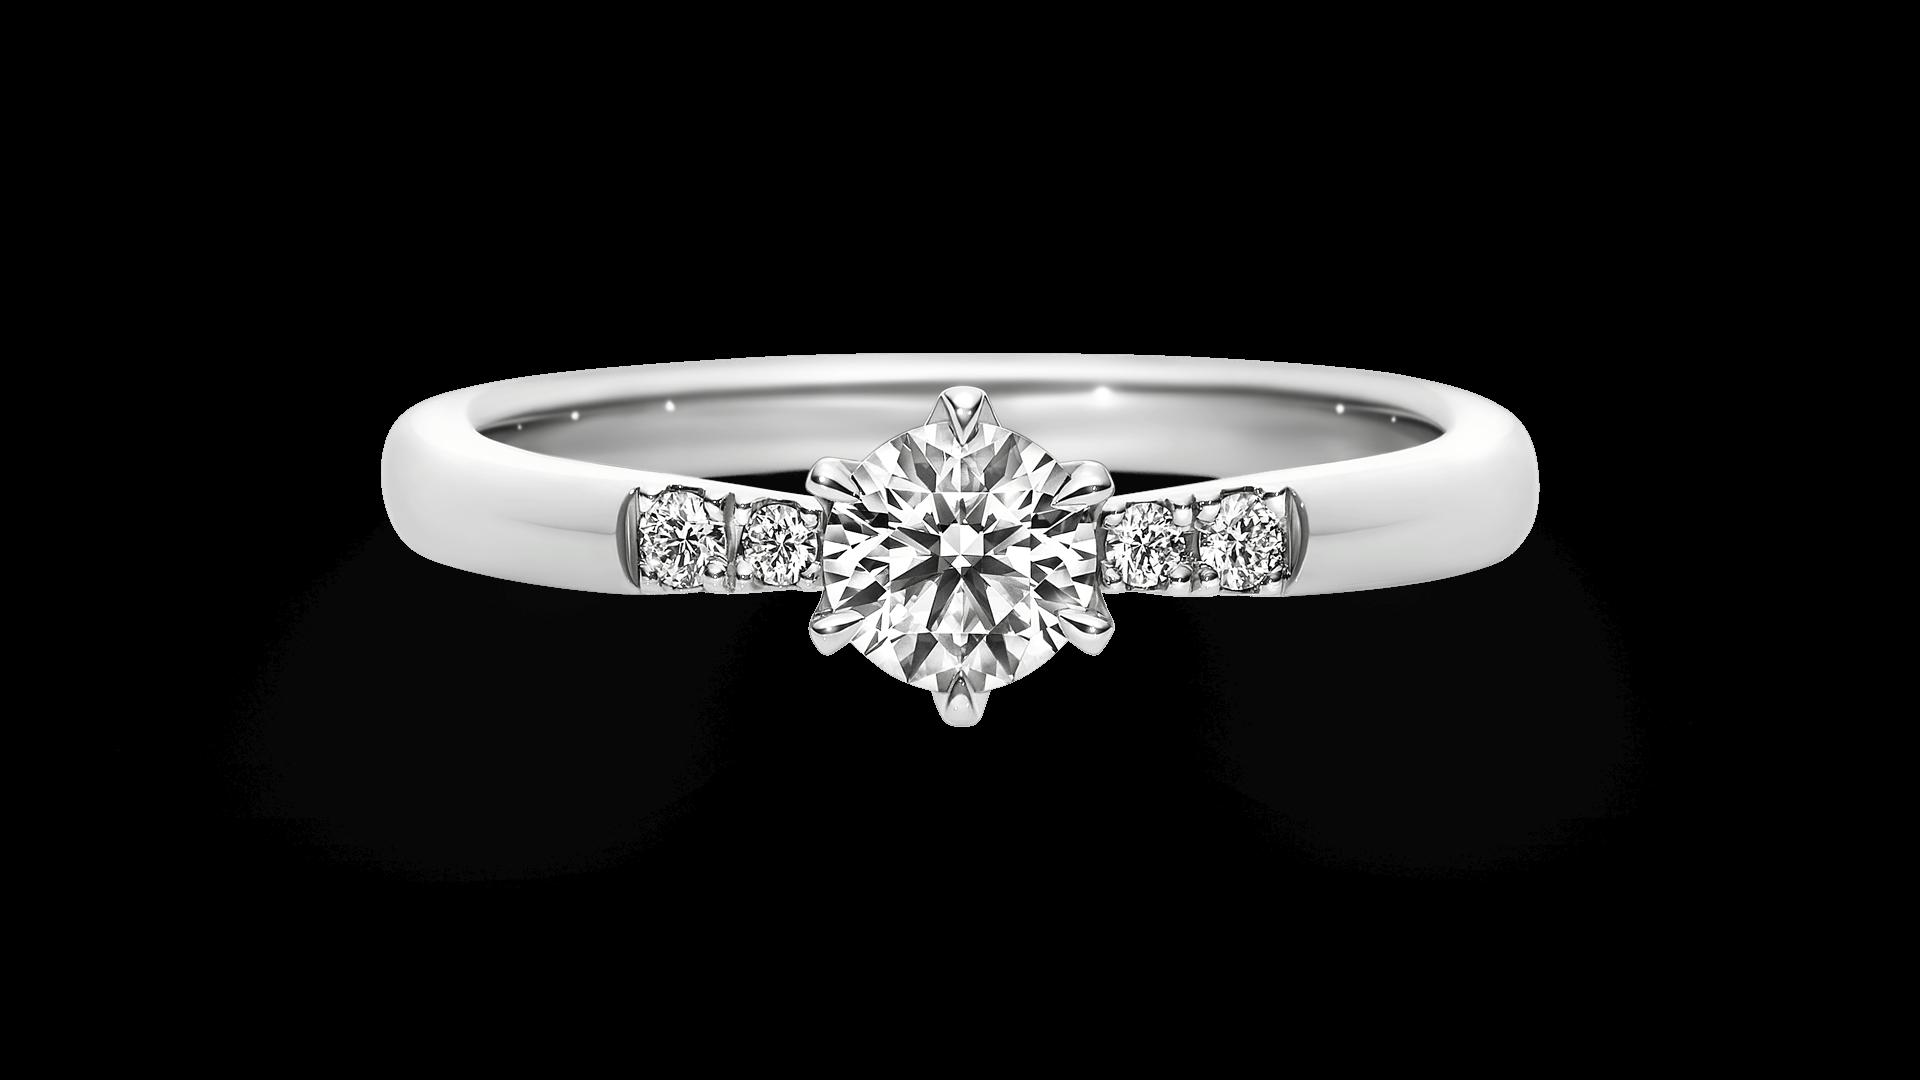 melpe メルーペ≪7月23日(木)発売≫ | 婚約指輪サムネイル 1